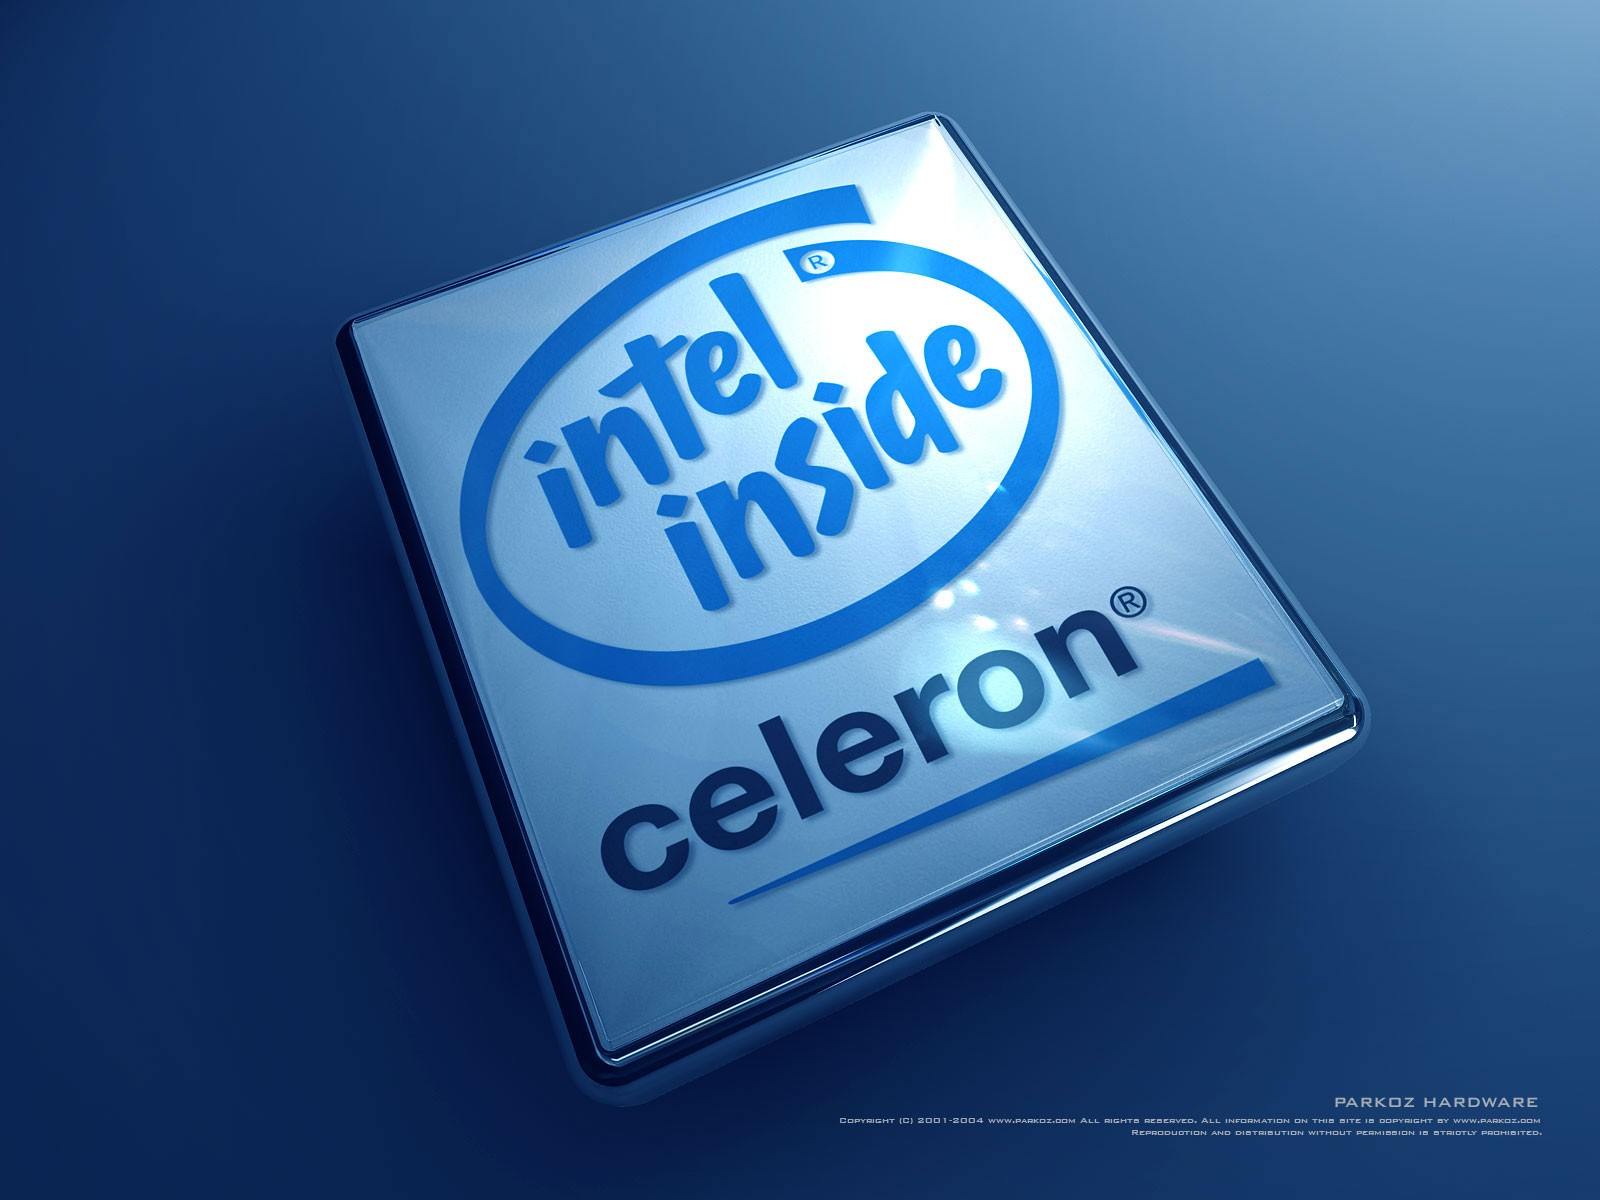 intel brands logos companies celeron wallpaper 1600x1200